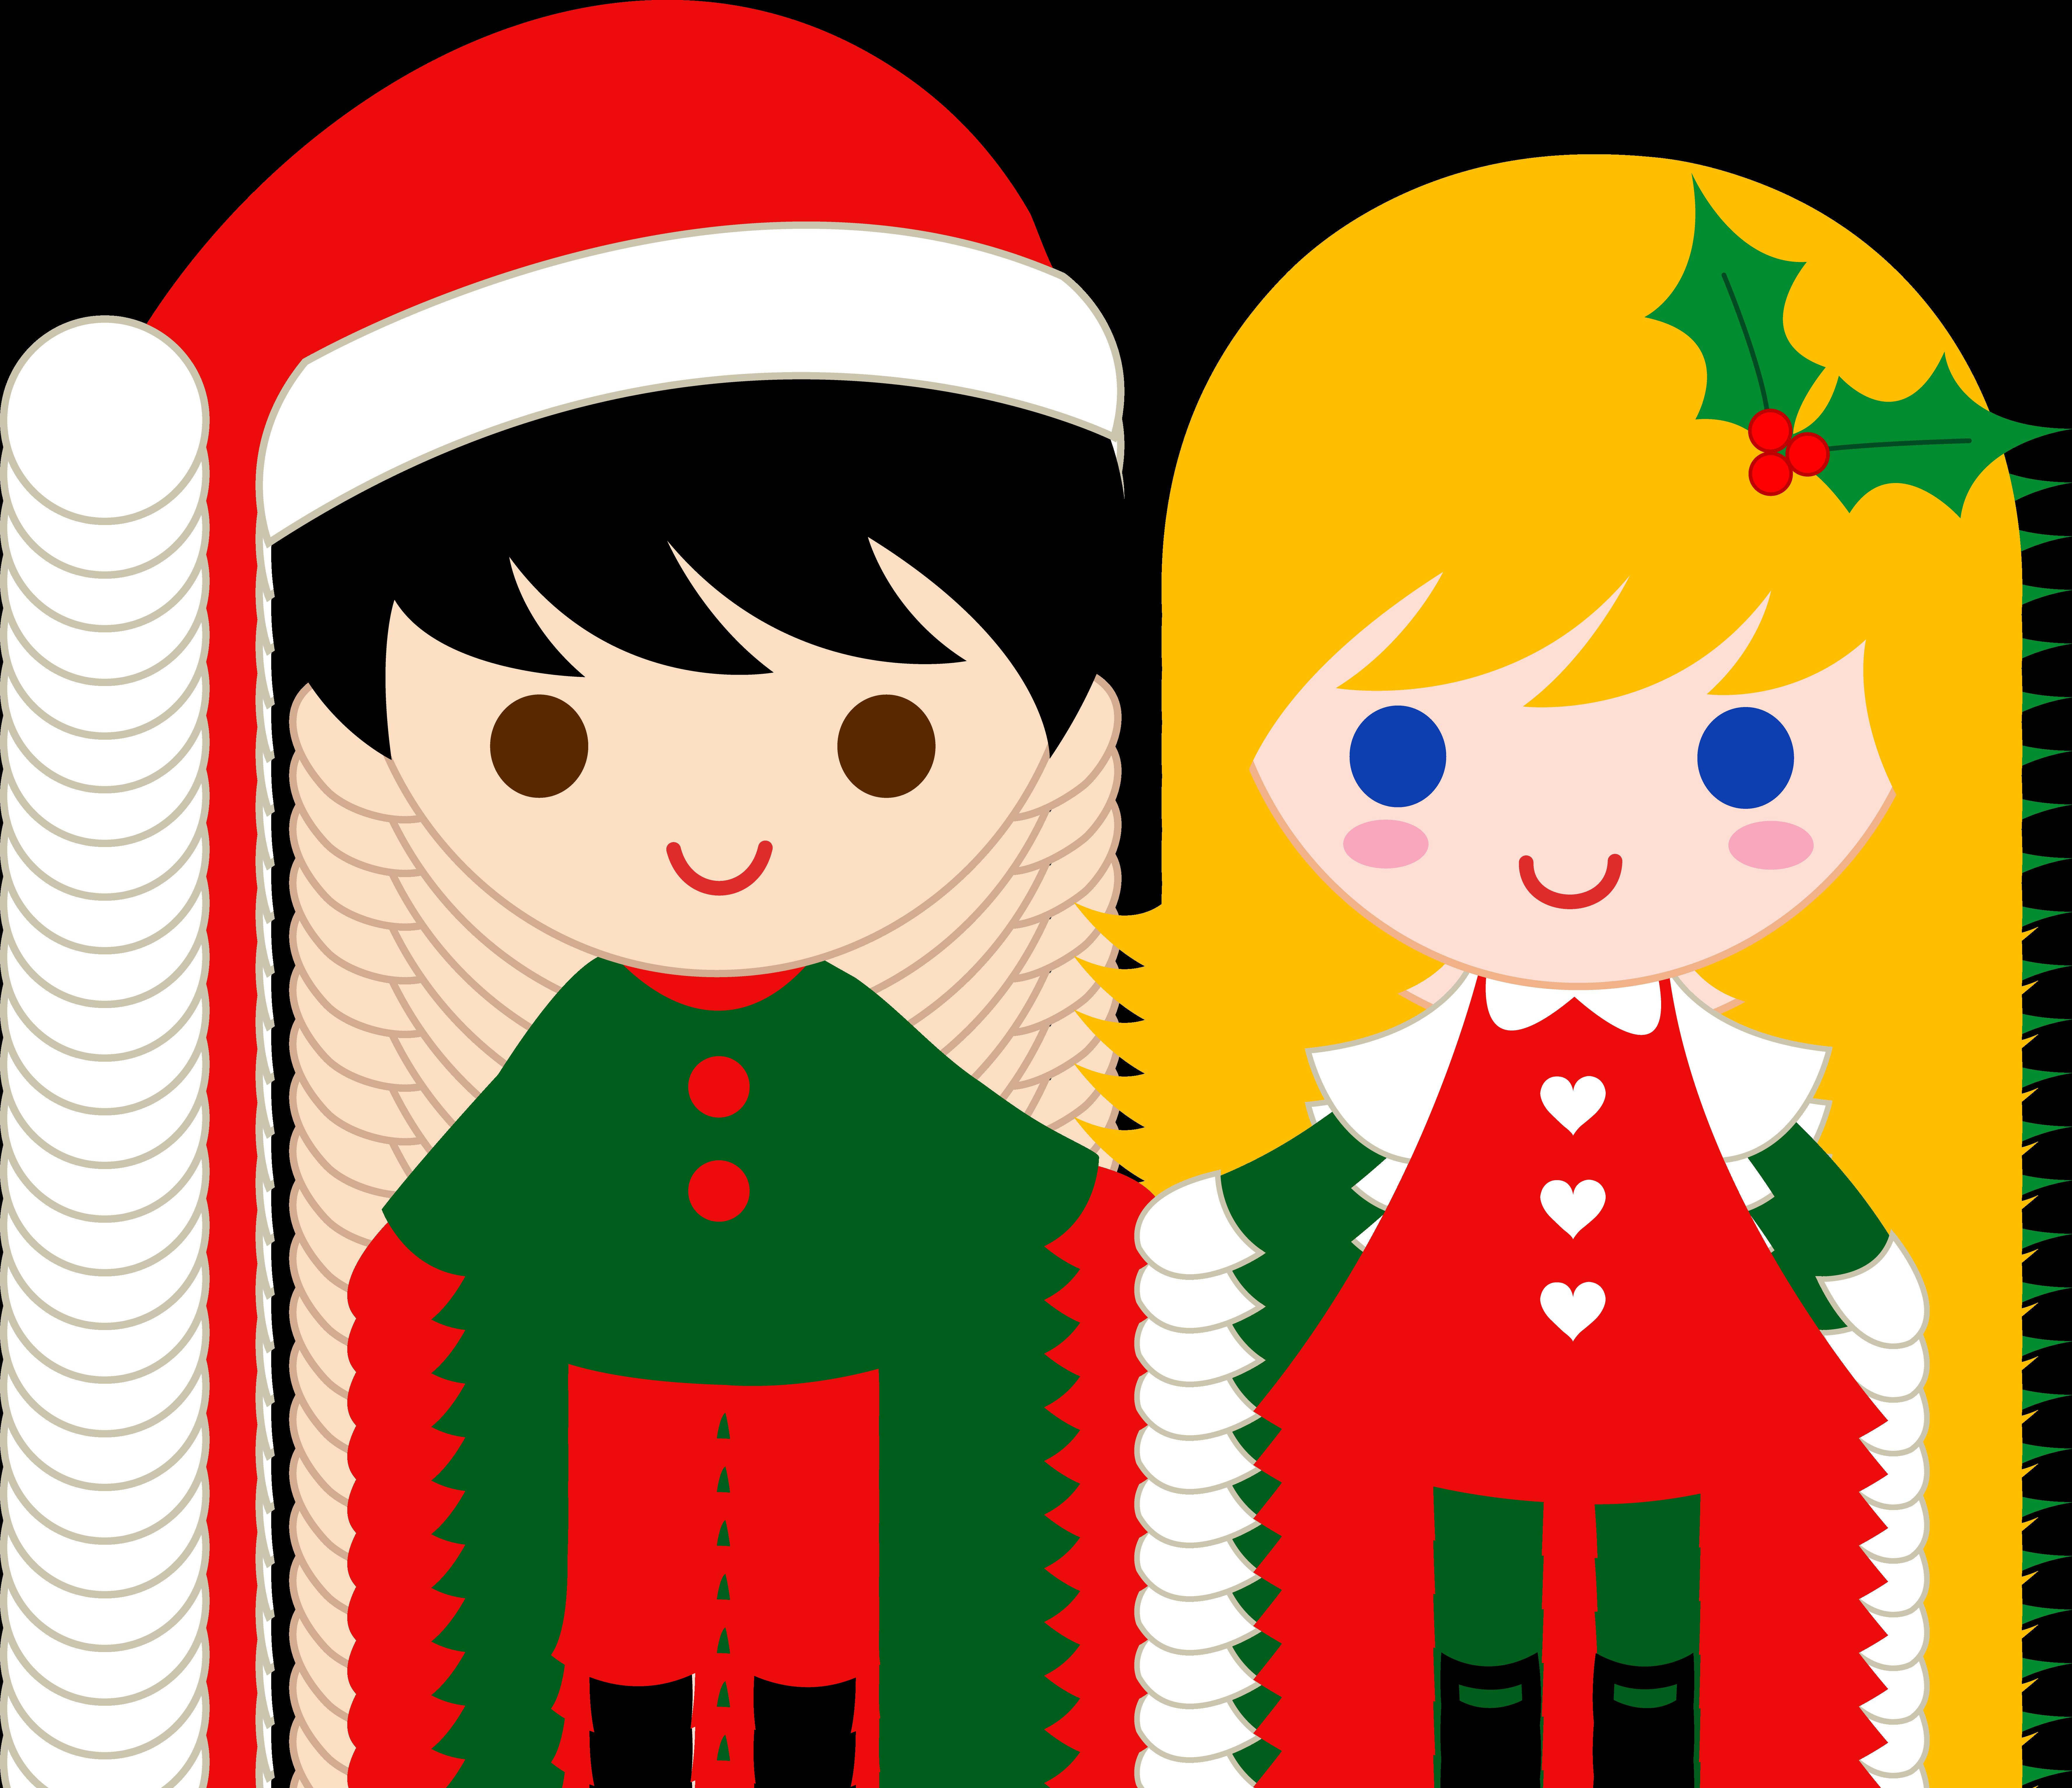 Children s christmas clipart free vector download cute children\'s clipart | Cute Christmas Kids Clip Art - Free Clip ... vector download